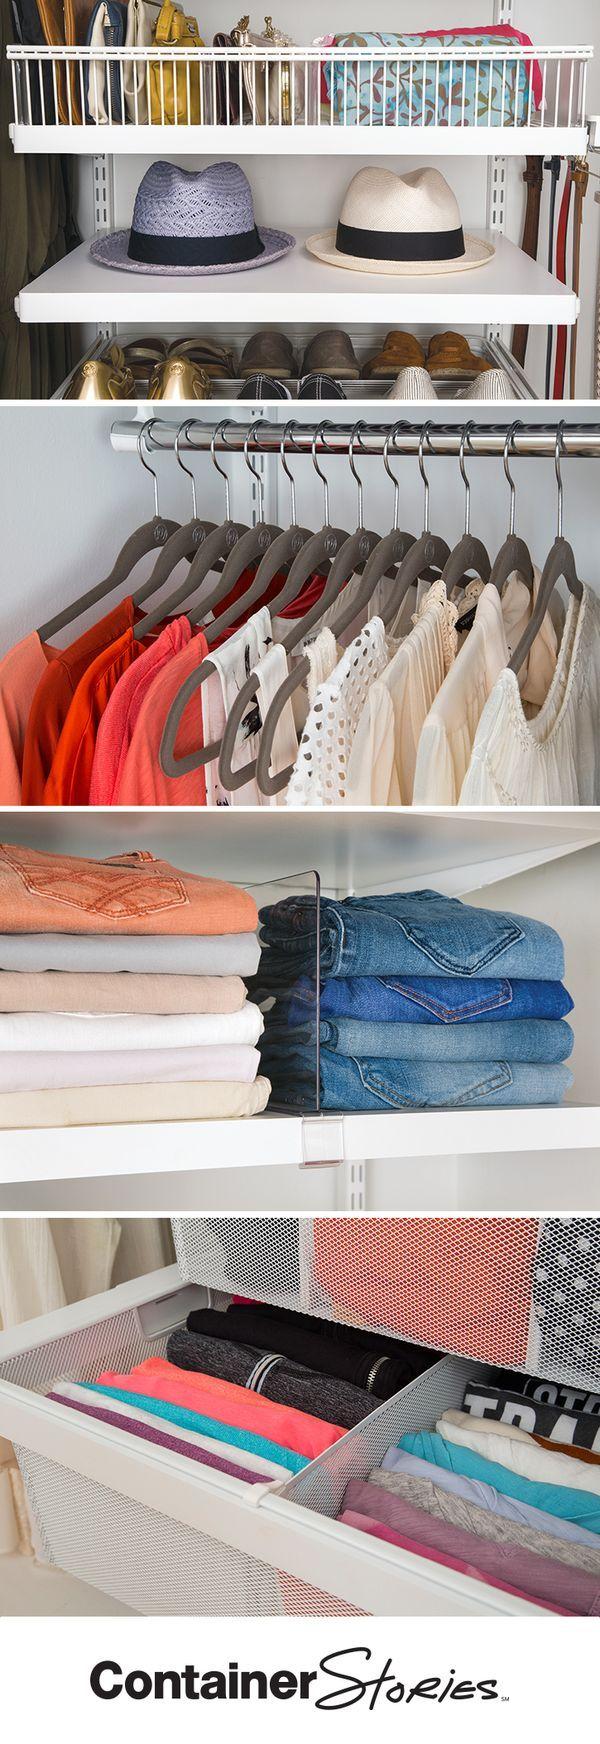 187 Best Images About Elfa Closet On Pinterest Closet